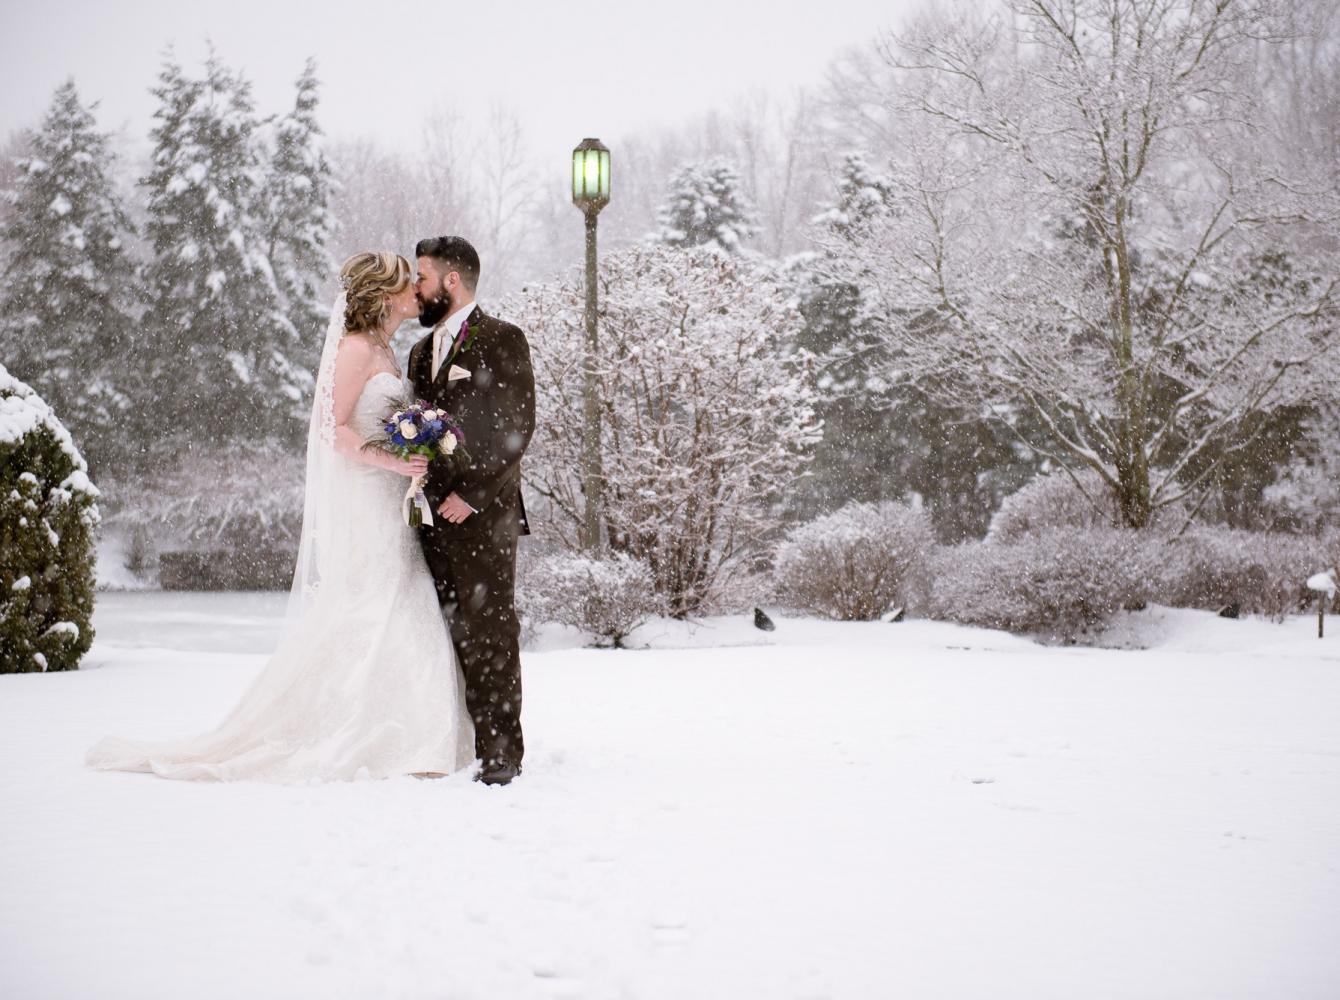 Jen & Steve at The Bridgewater Manor